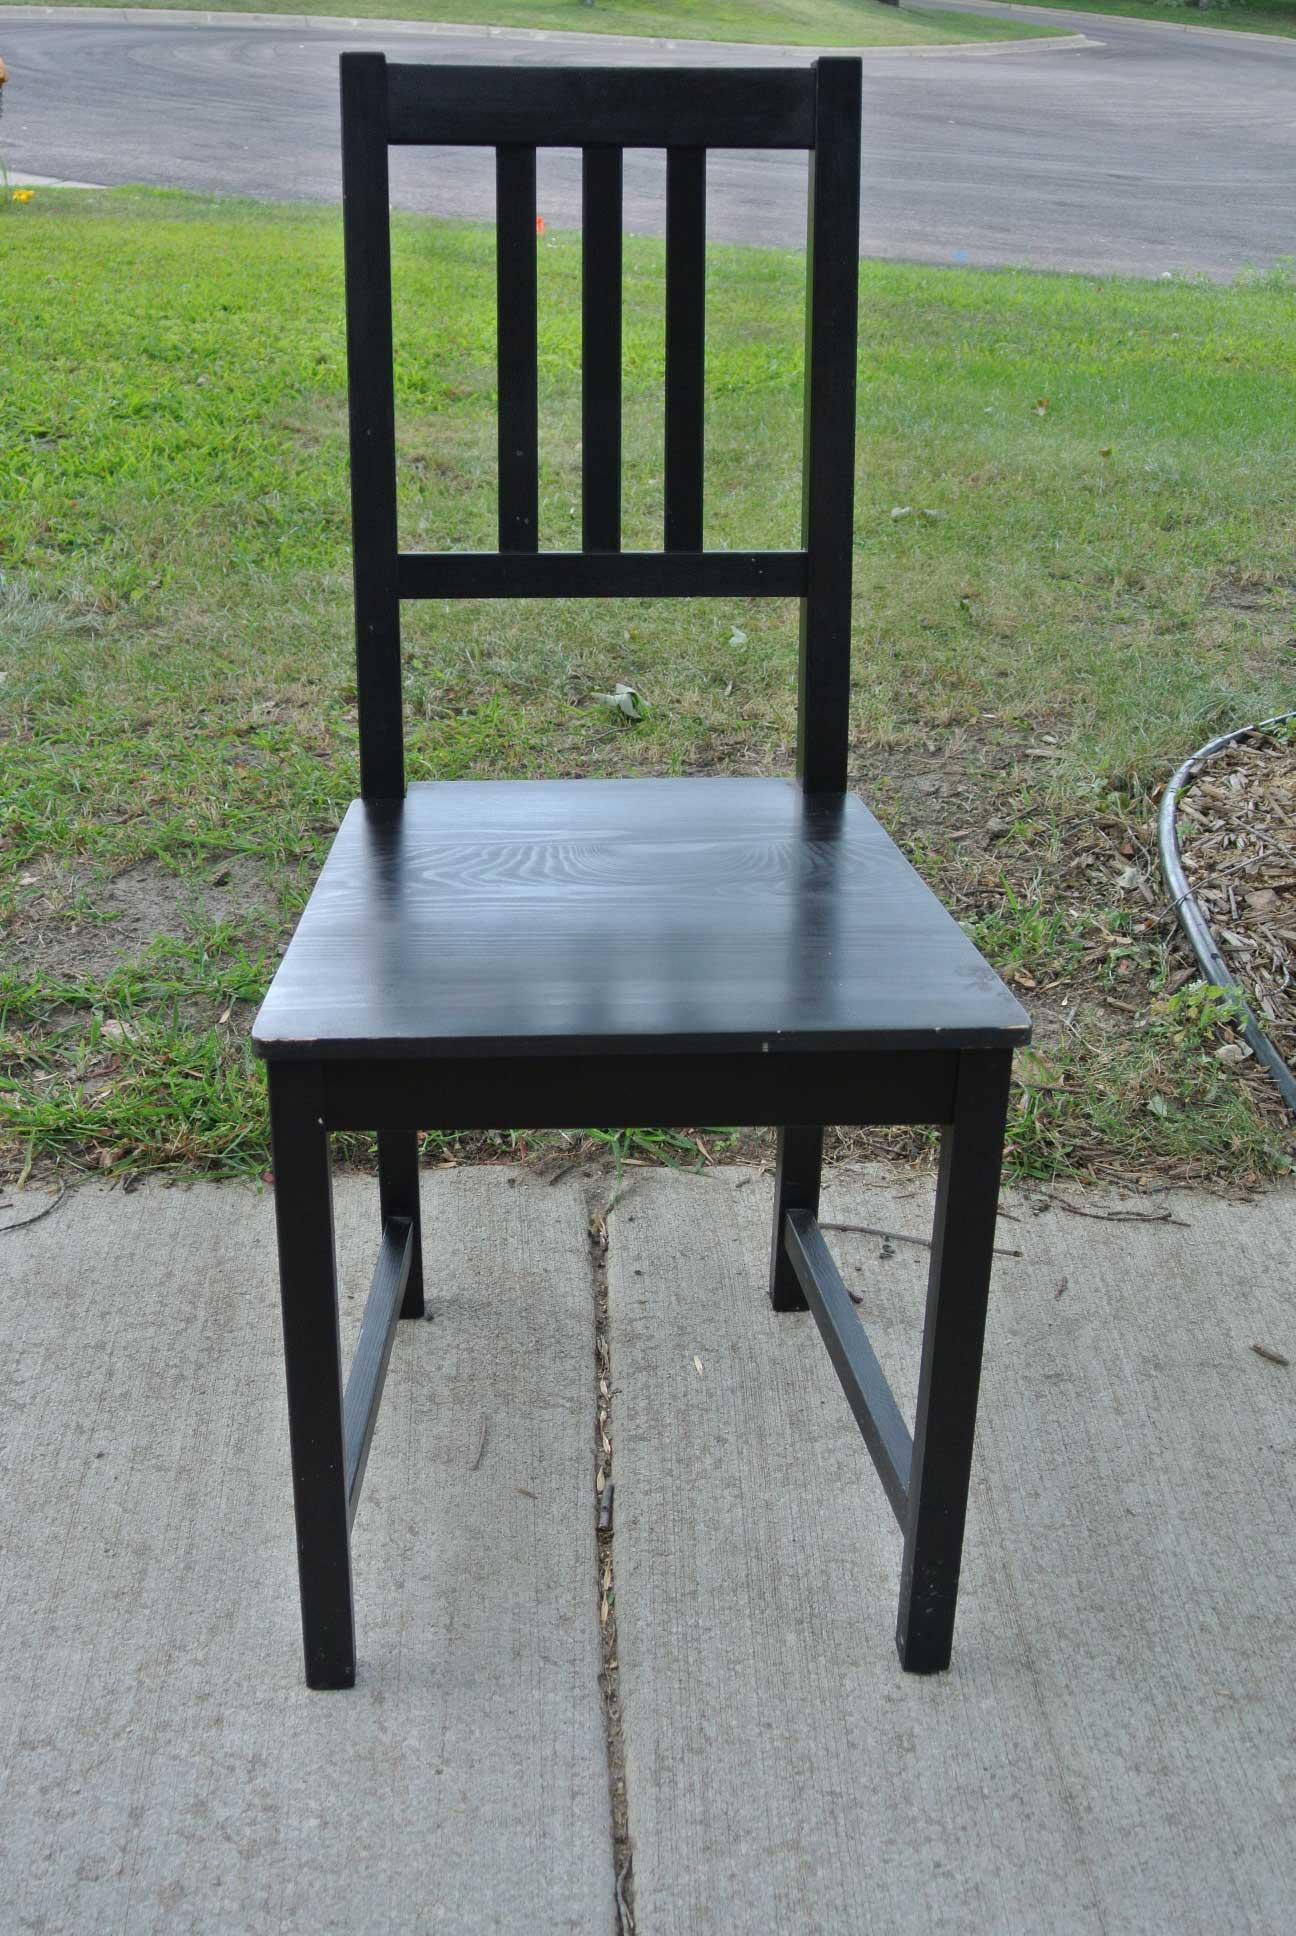 ikea parsons chair desk rollers hack parson jessi 2013 08 15 11 09